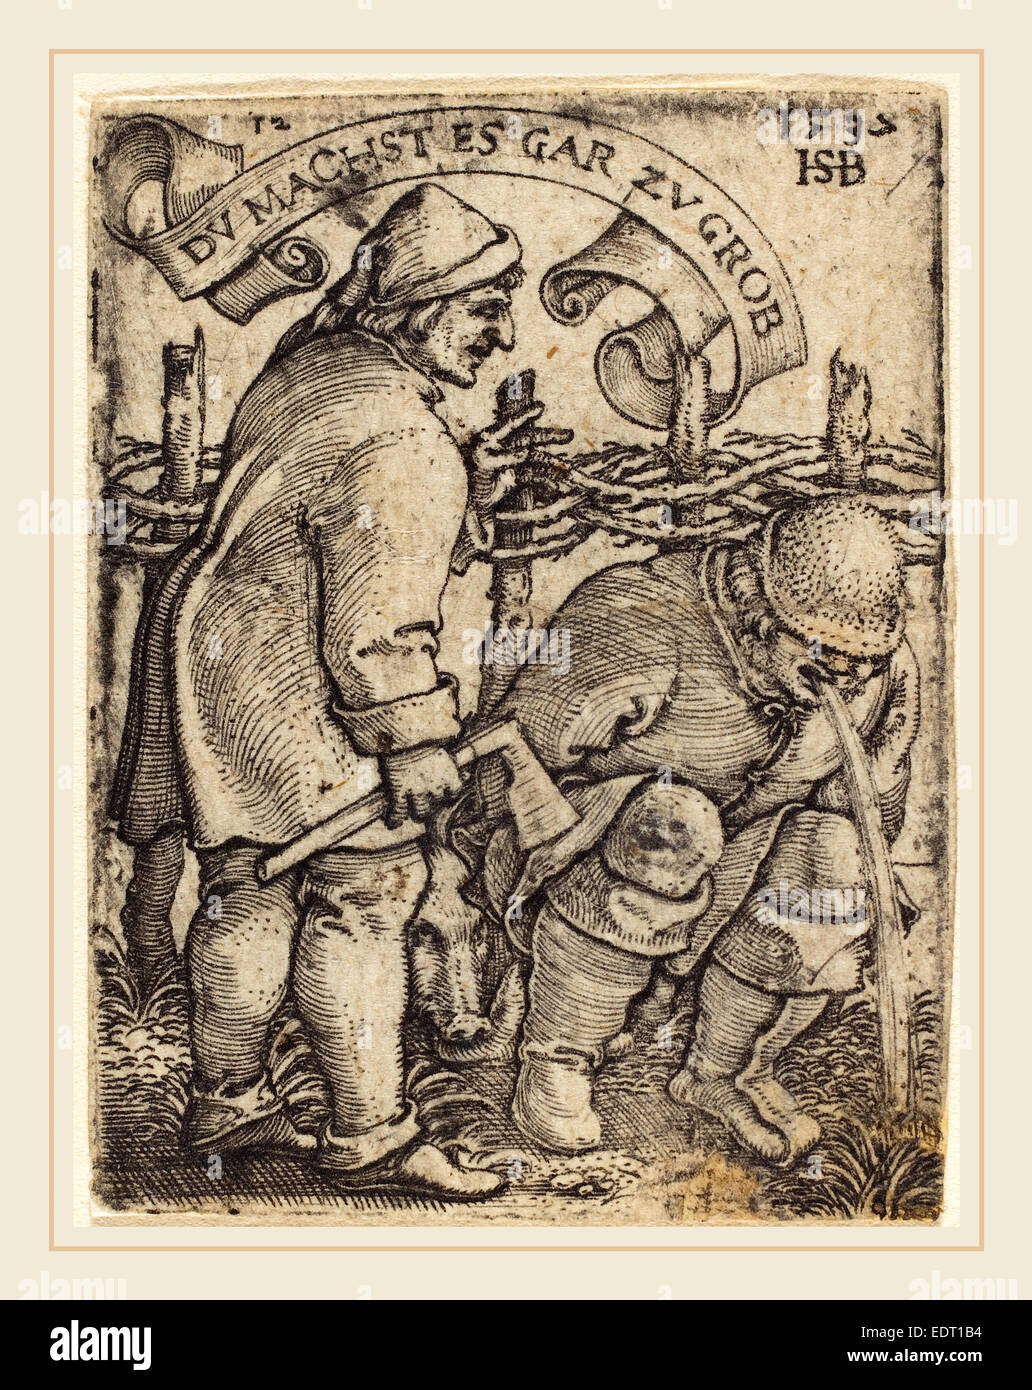 Sebald Beham (German, 1500-1550), Vomiting Peasant, engraving - Stock Image